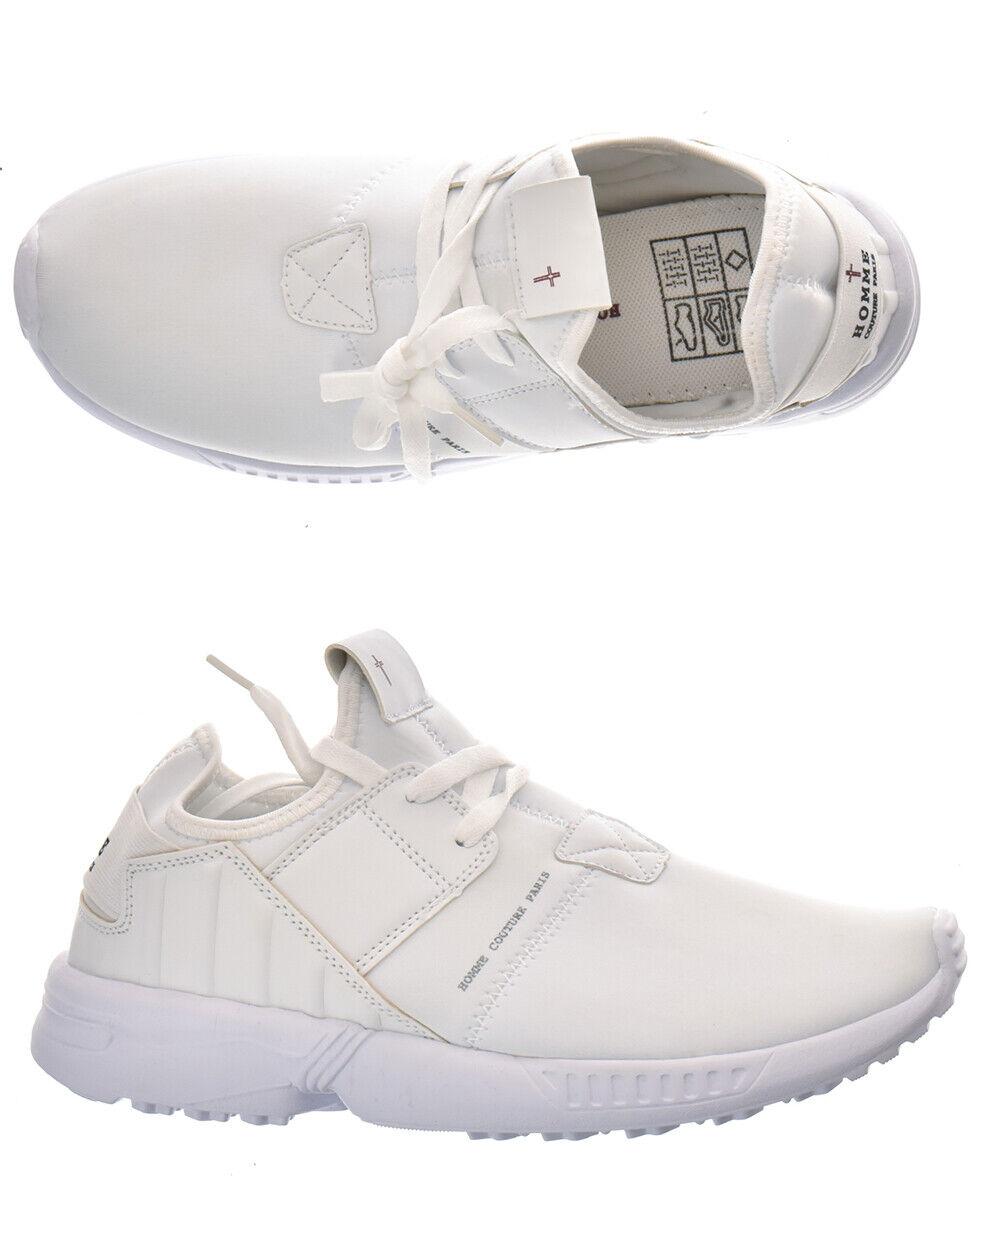 shoes Sneaker Daniele Alessandrini shoes men Bianco F20093707 2